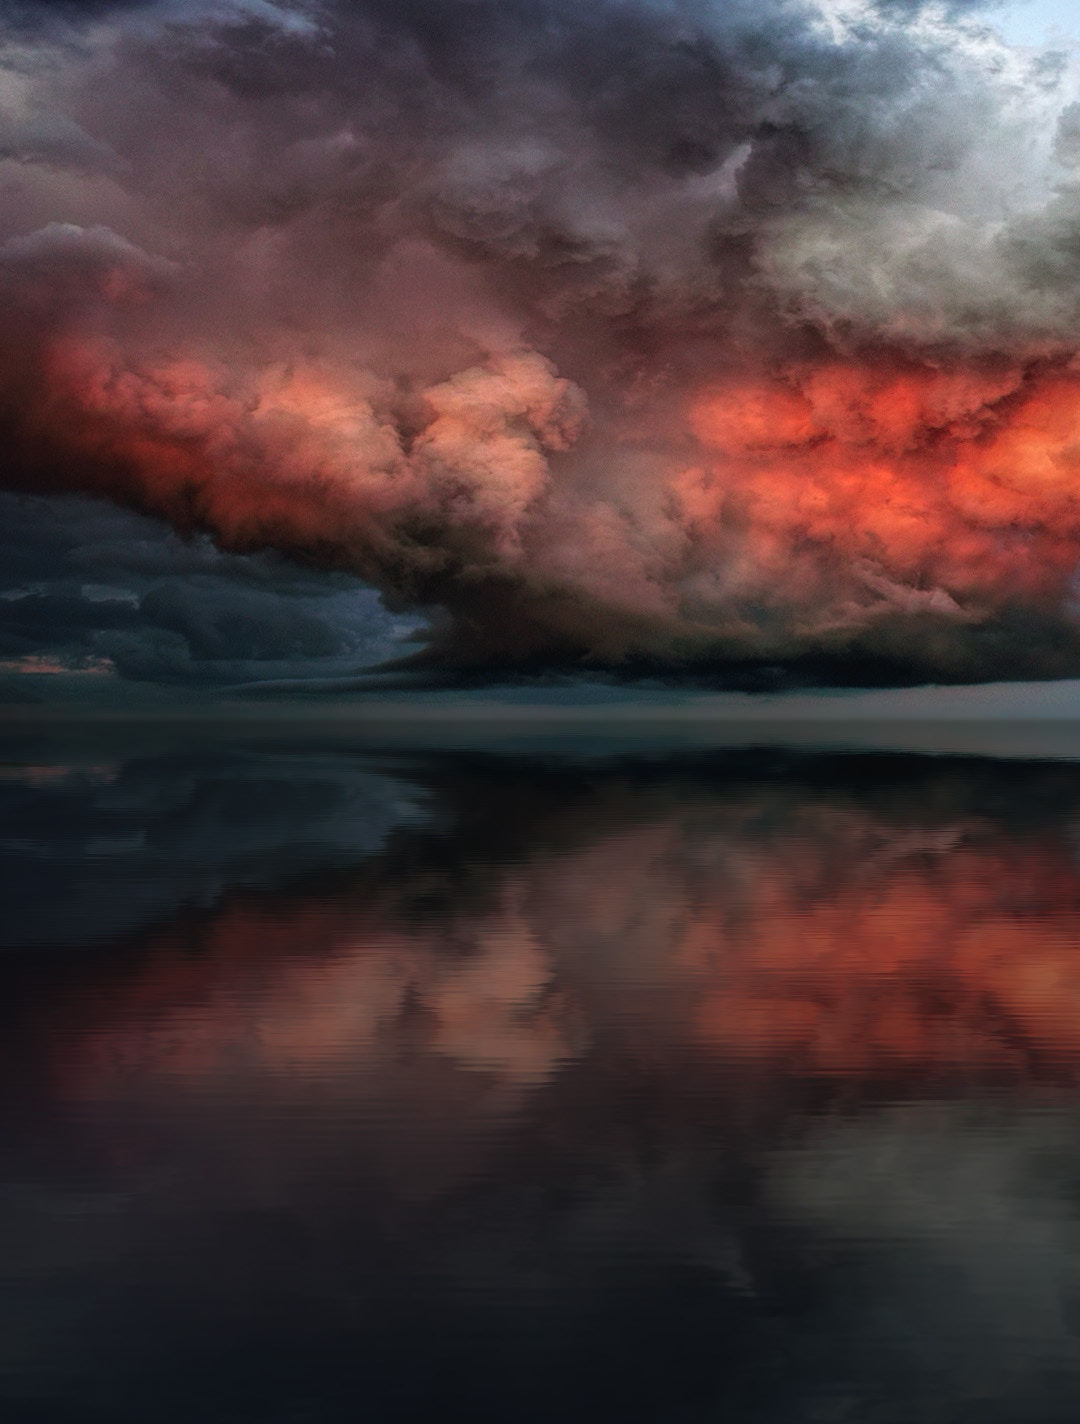 Storm iPhone Wallpaper